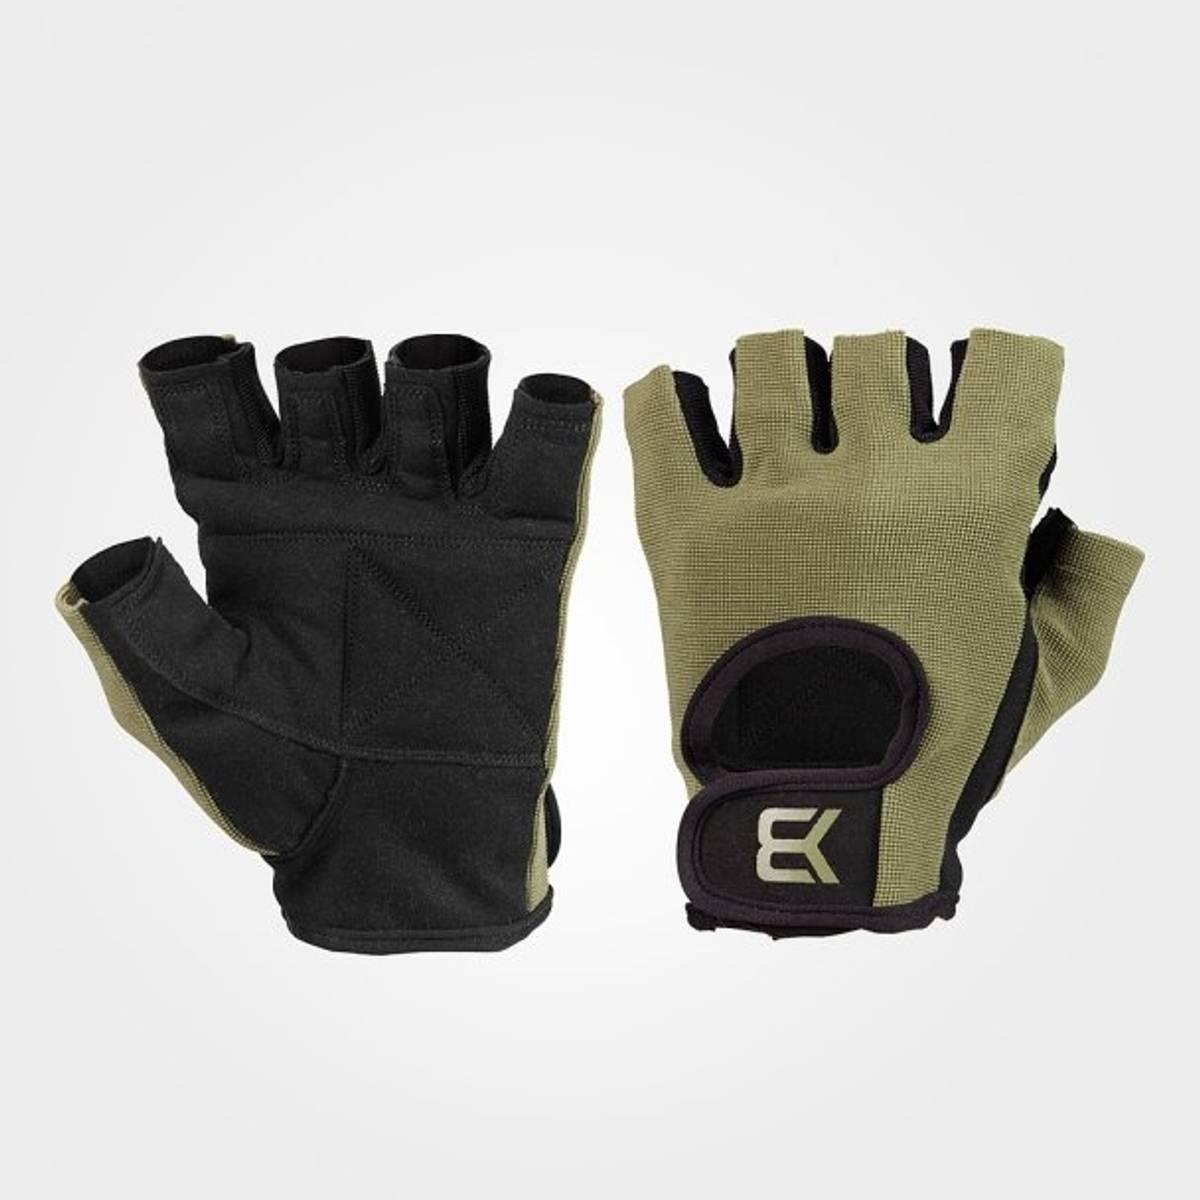 Basic Gym Gloves